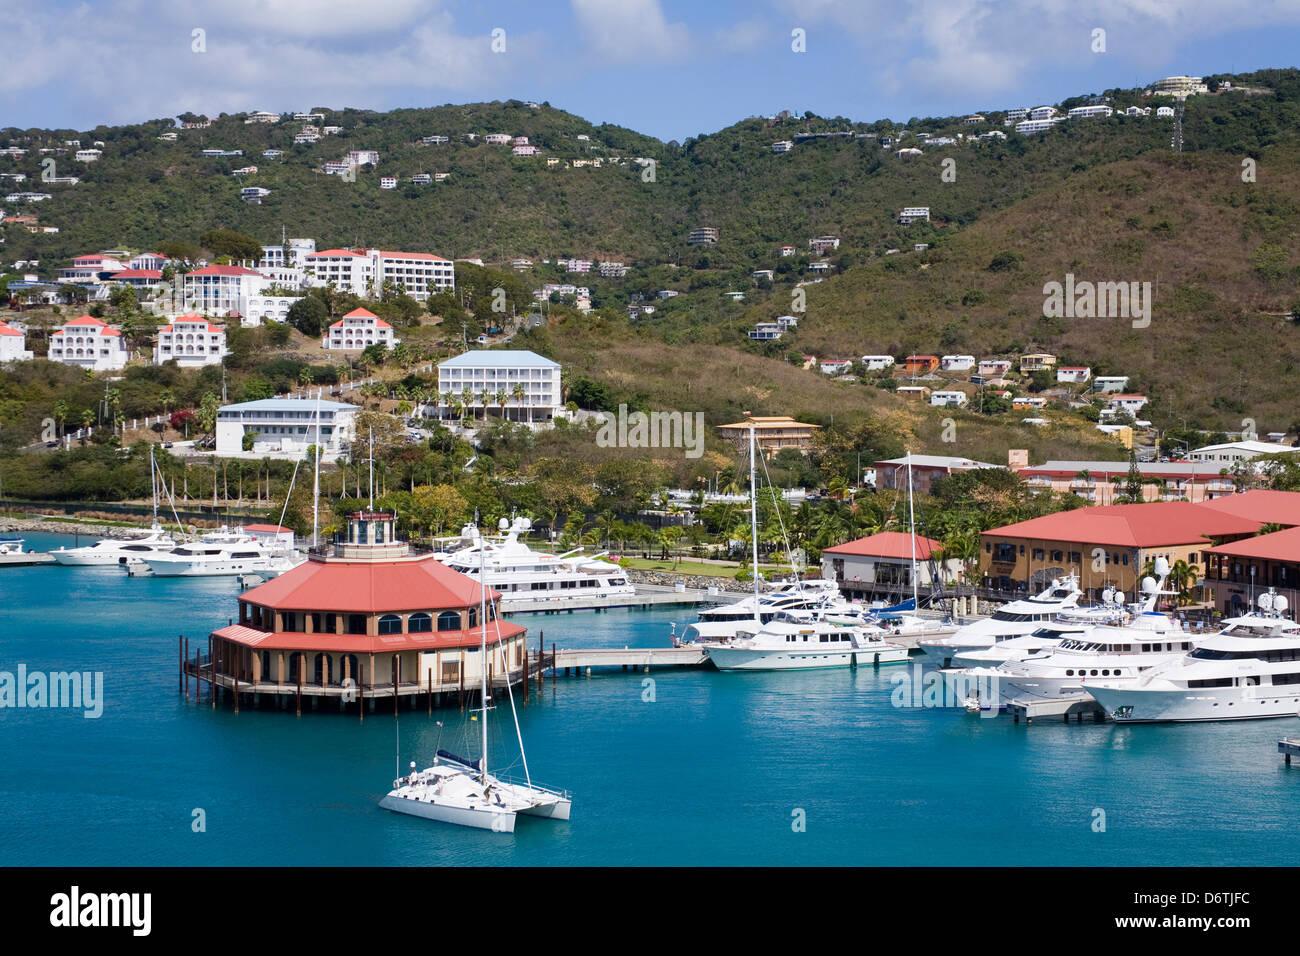 united states virgin islands caribbean st thomas